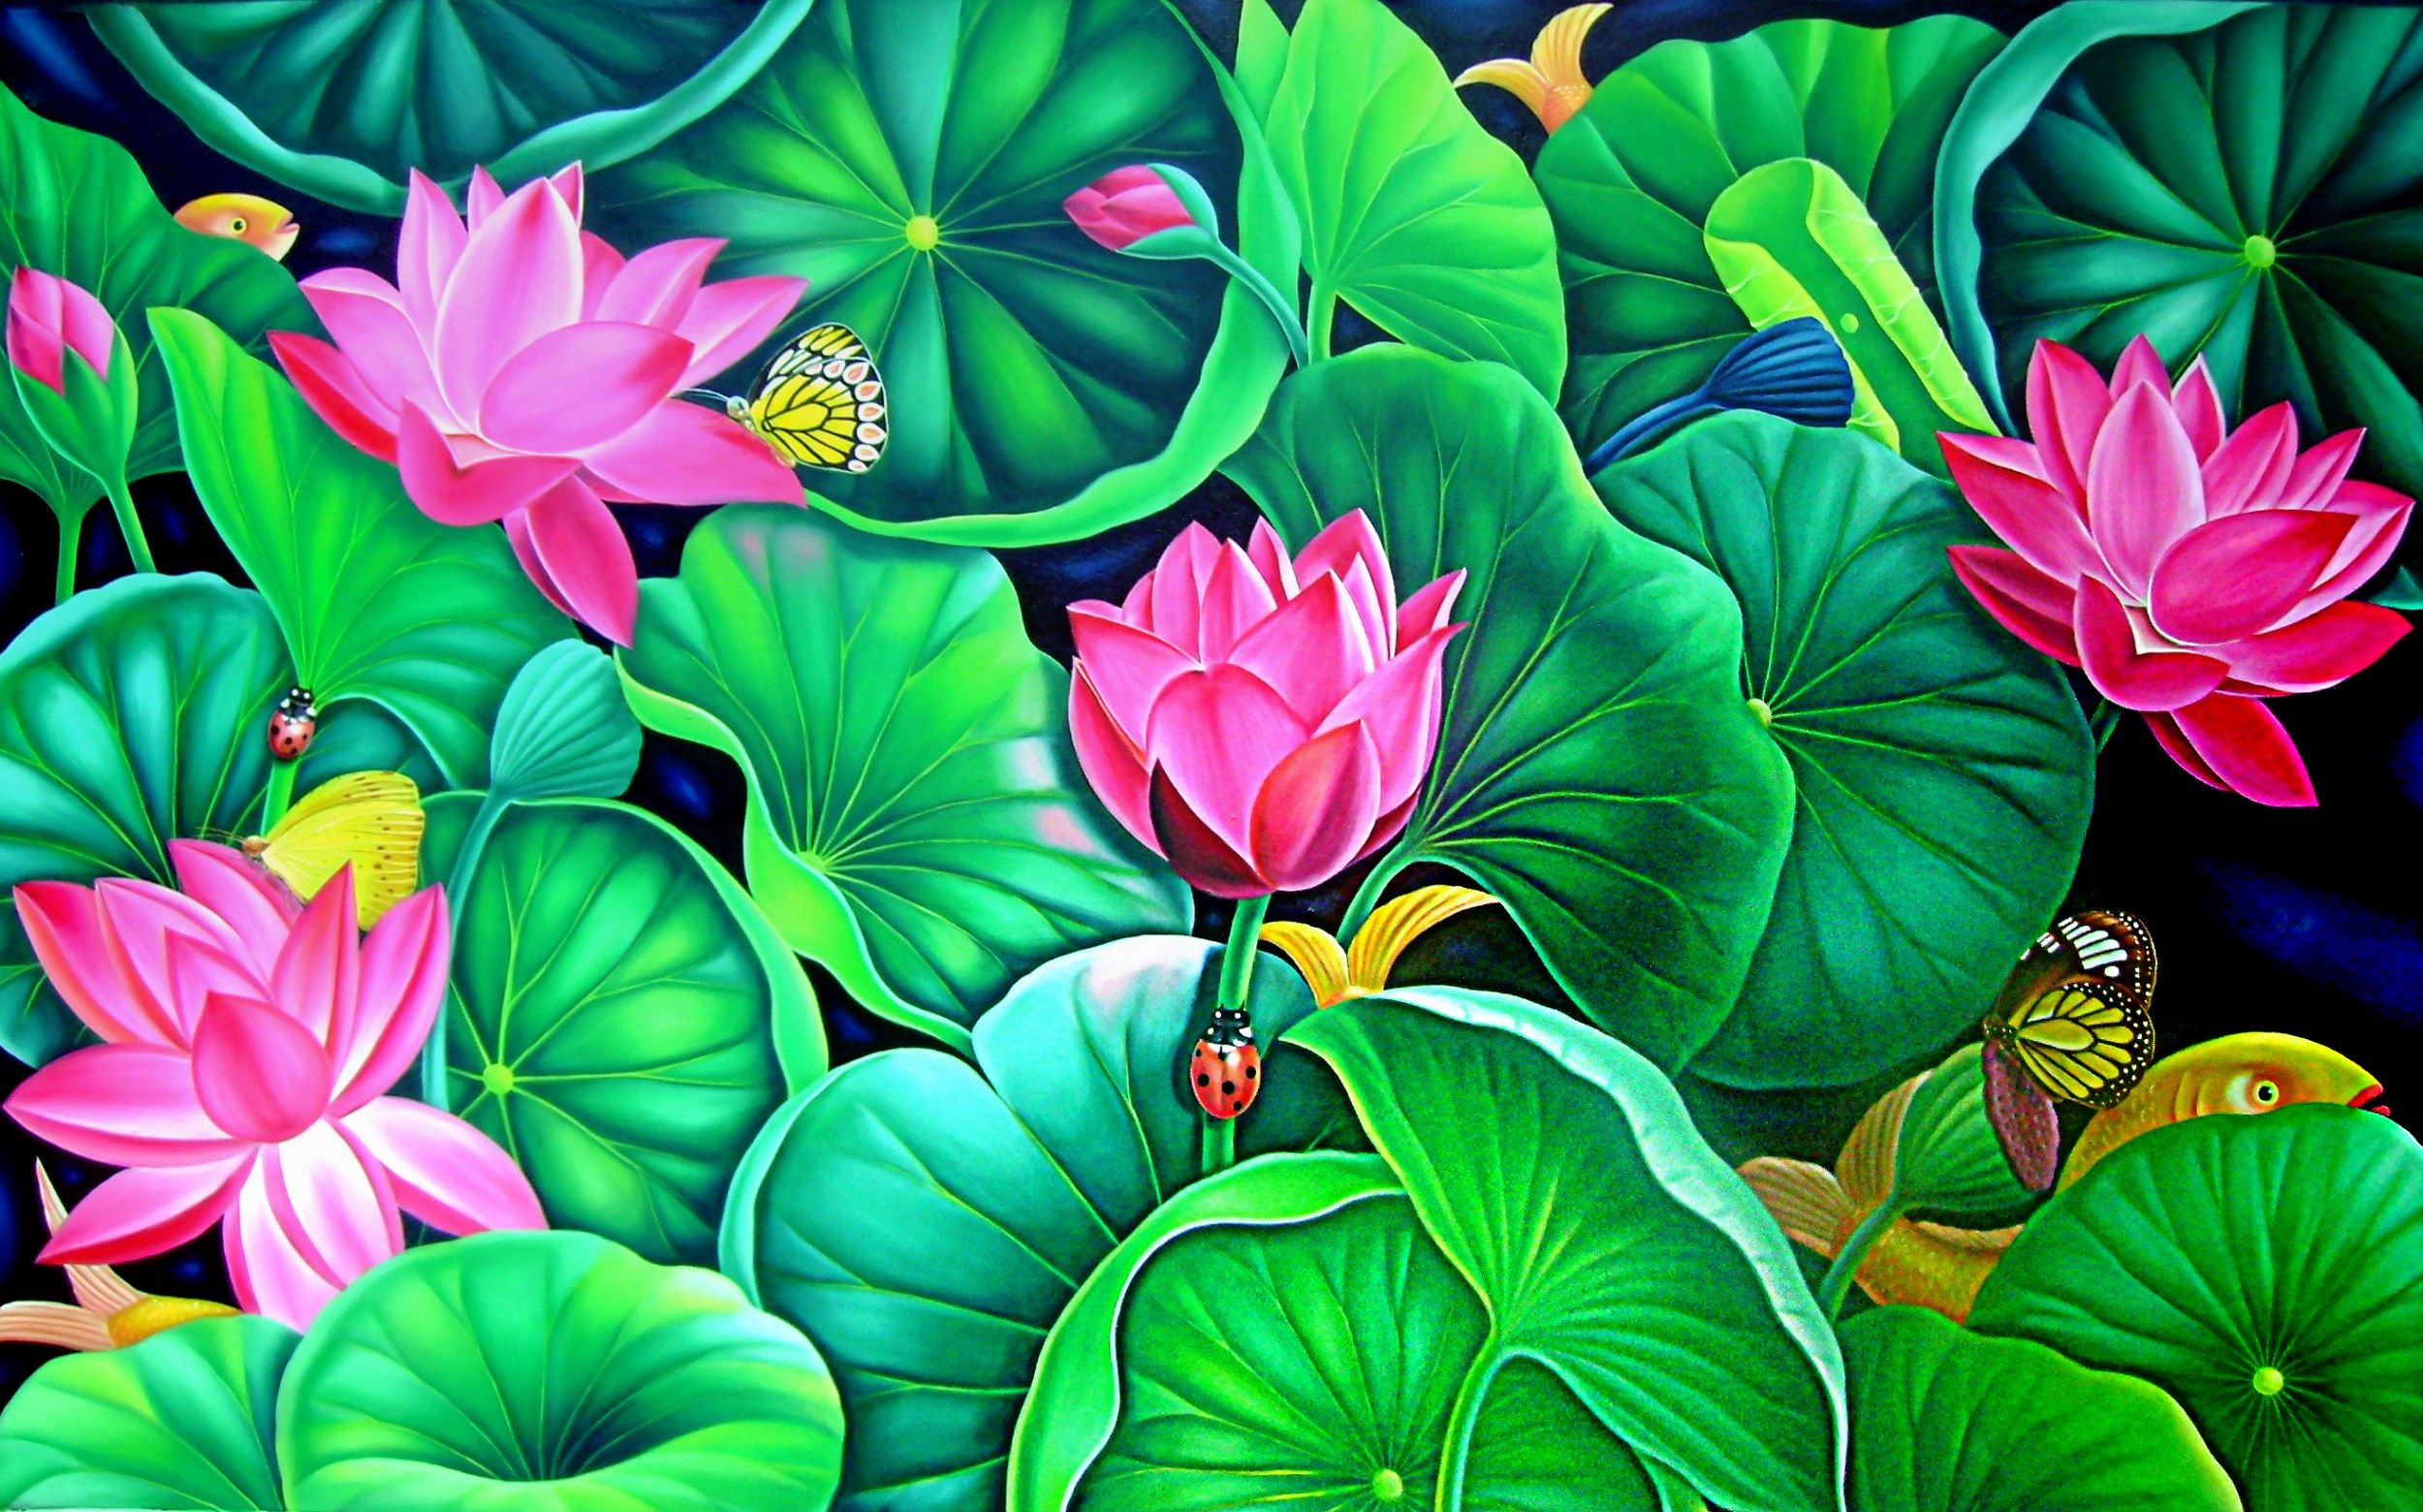 Lotus Murali Nagapuzha Artwork Celeste Network